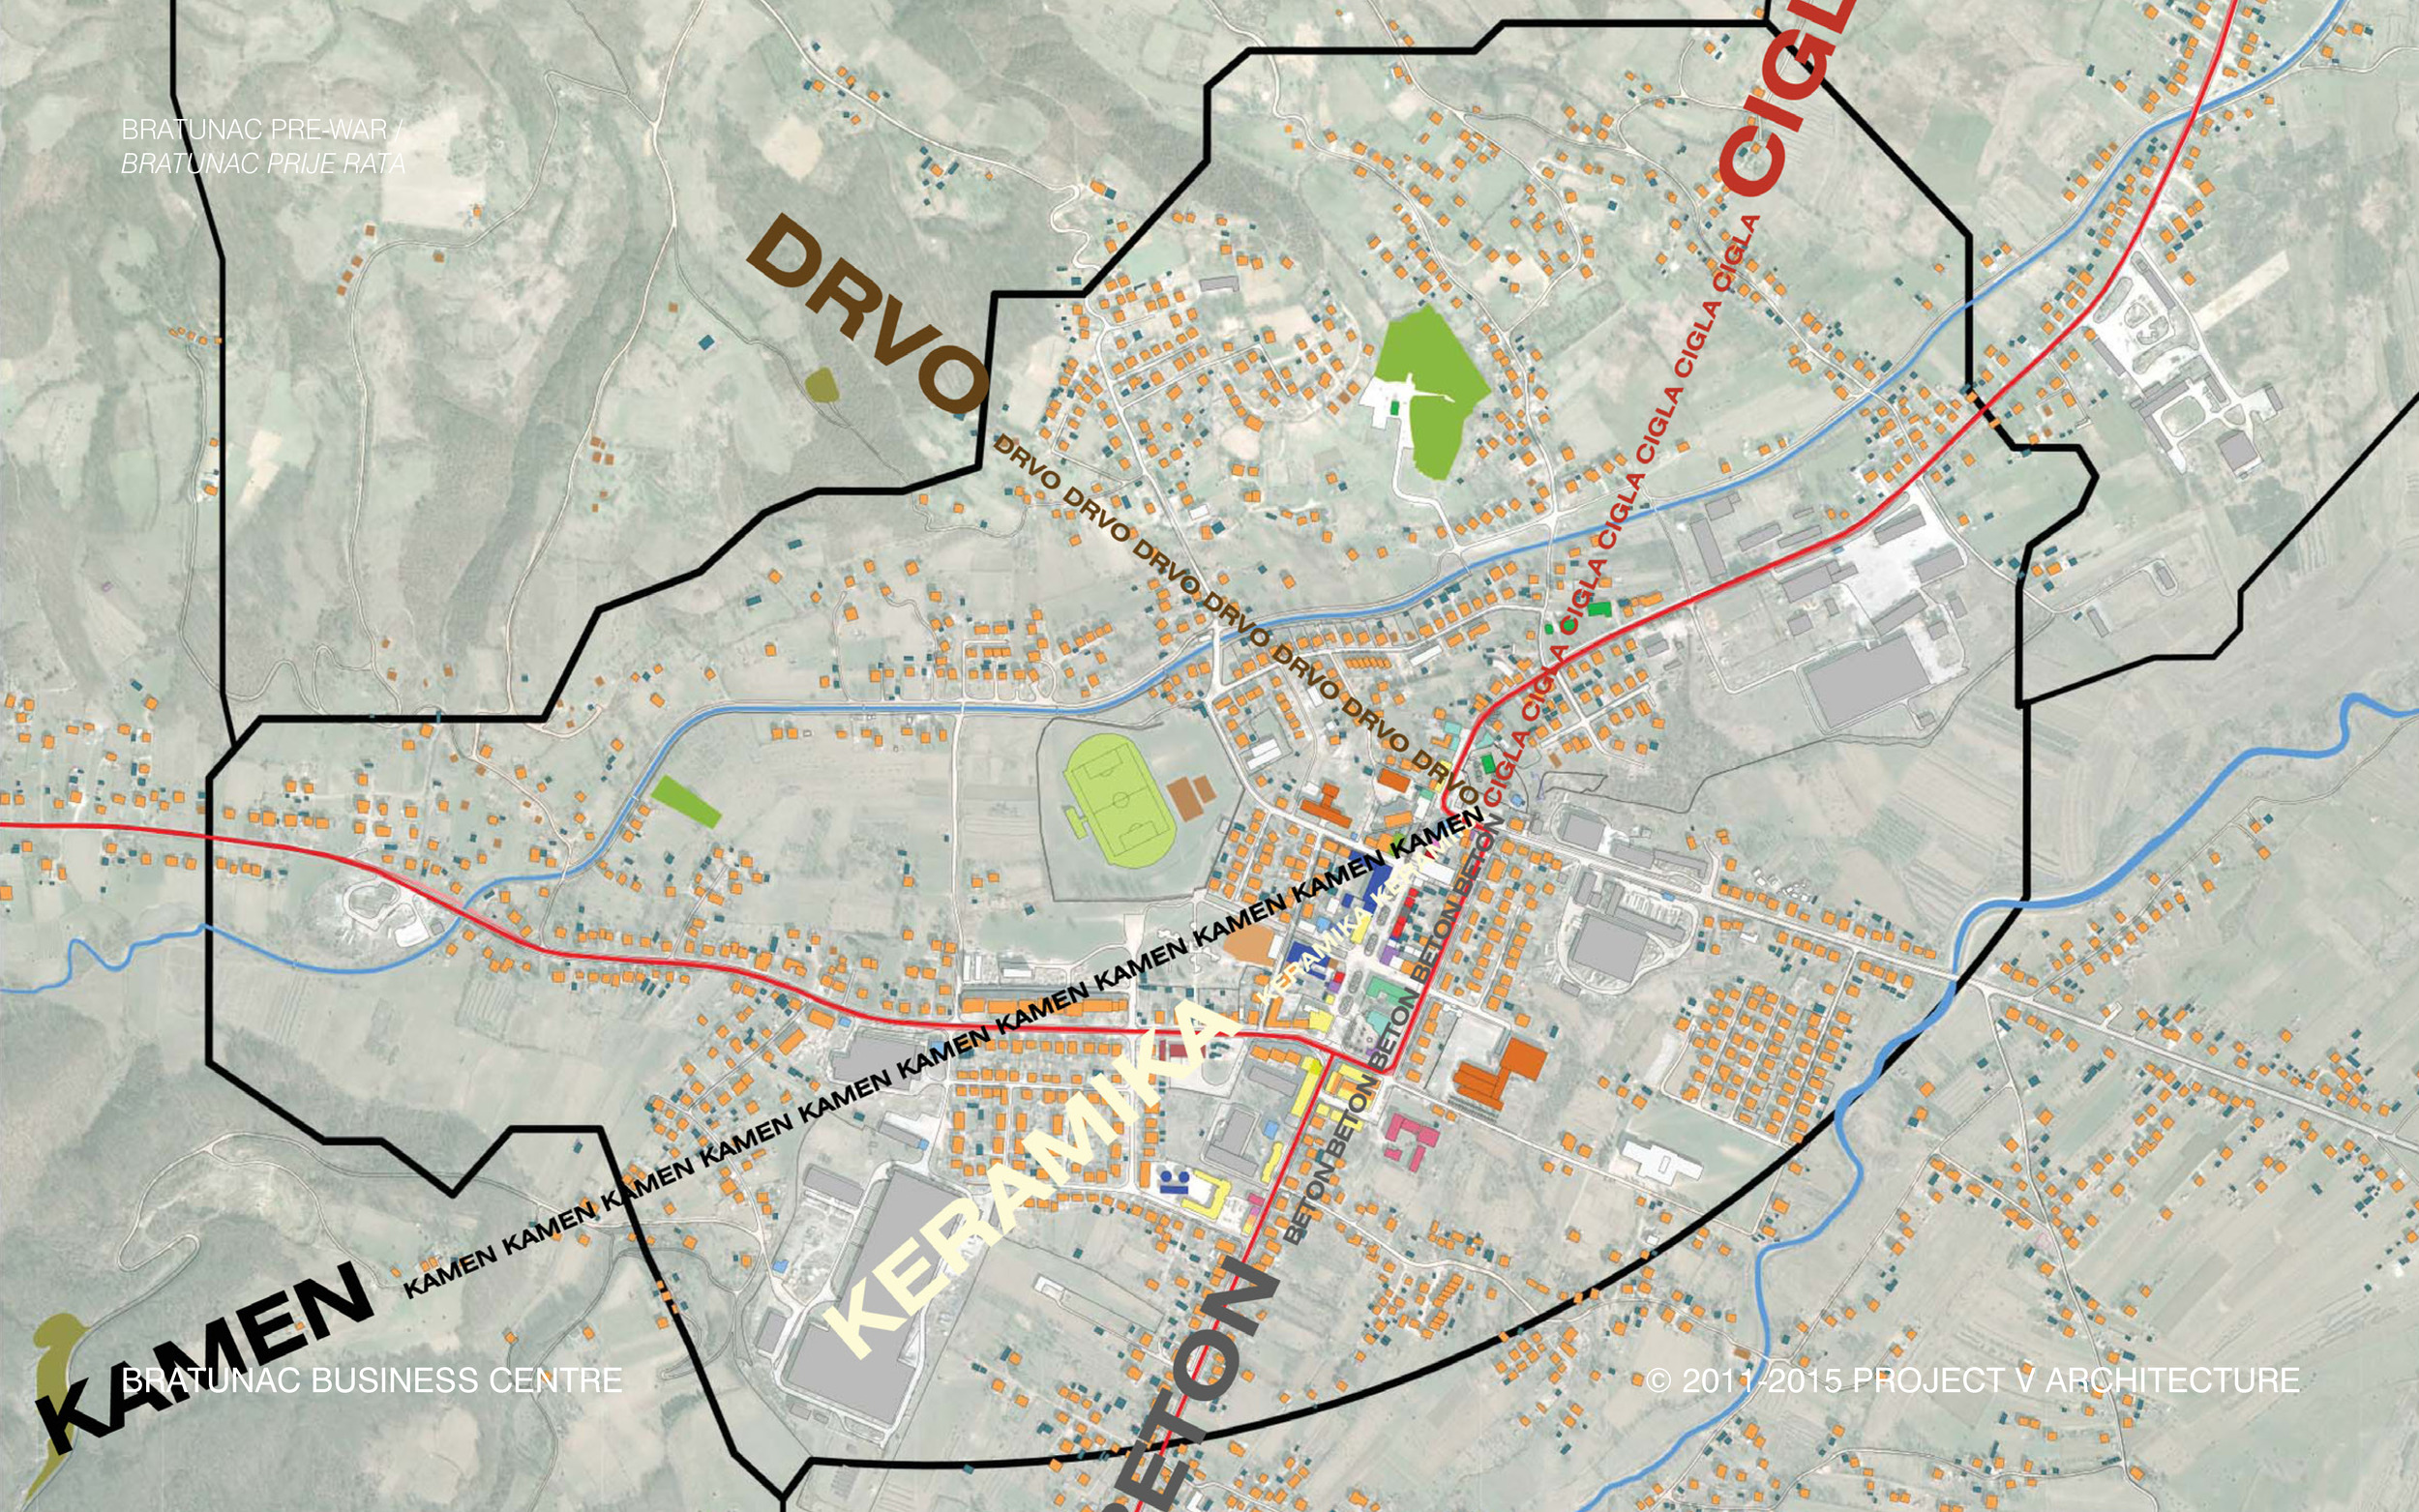 V PROJECTS_office_website_bratunac business centre_04-1200.jpg